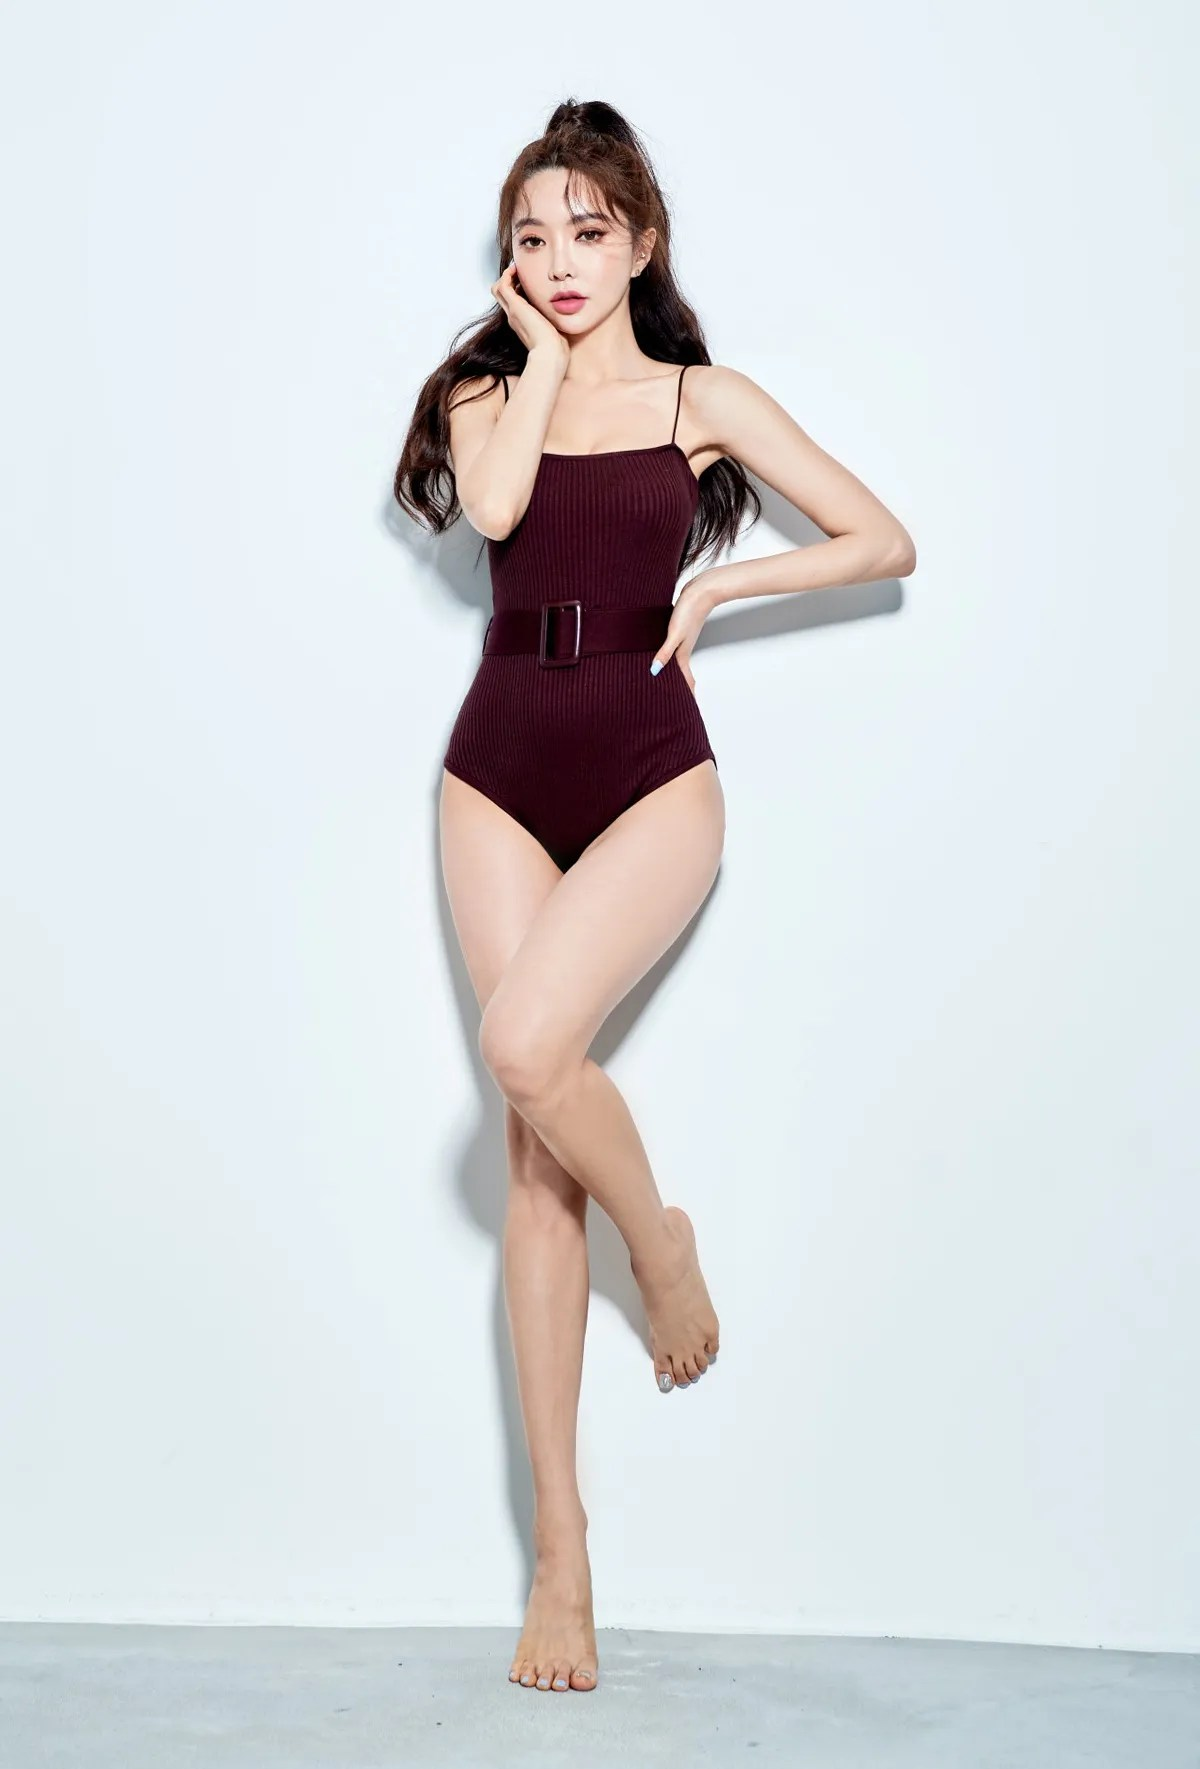 Park Suyeon / vendis / March 2021 / Indoor Beachwear Photoshoot Part 1